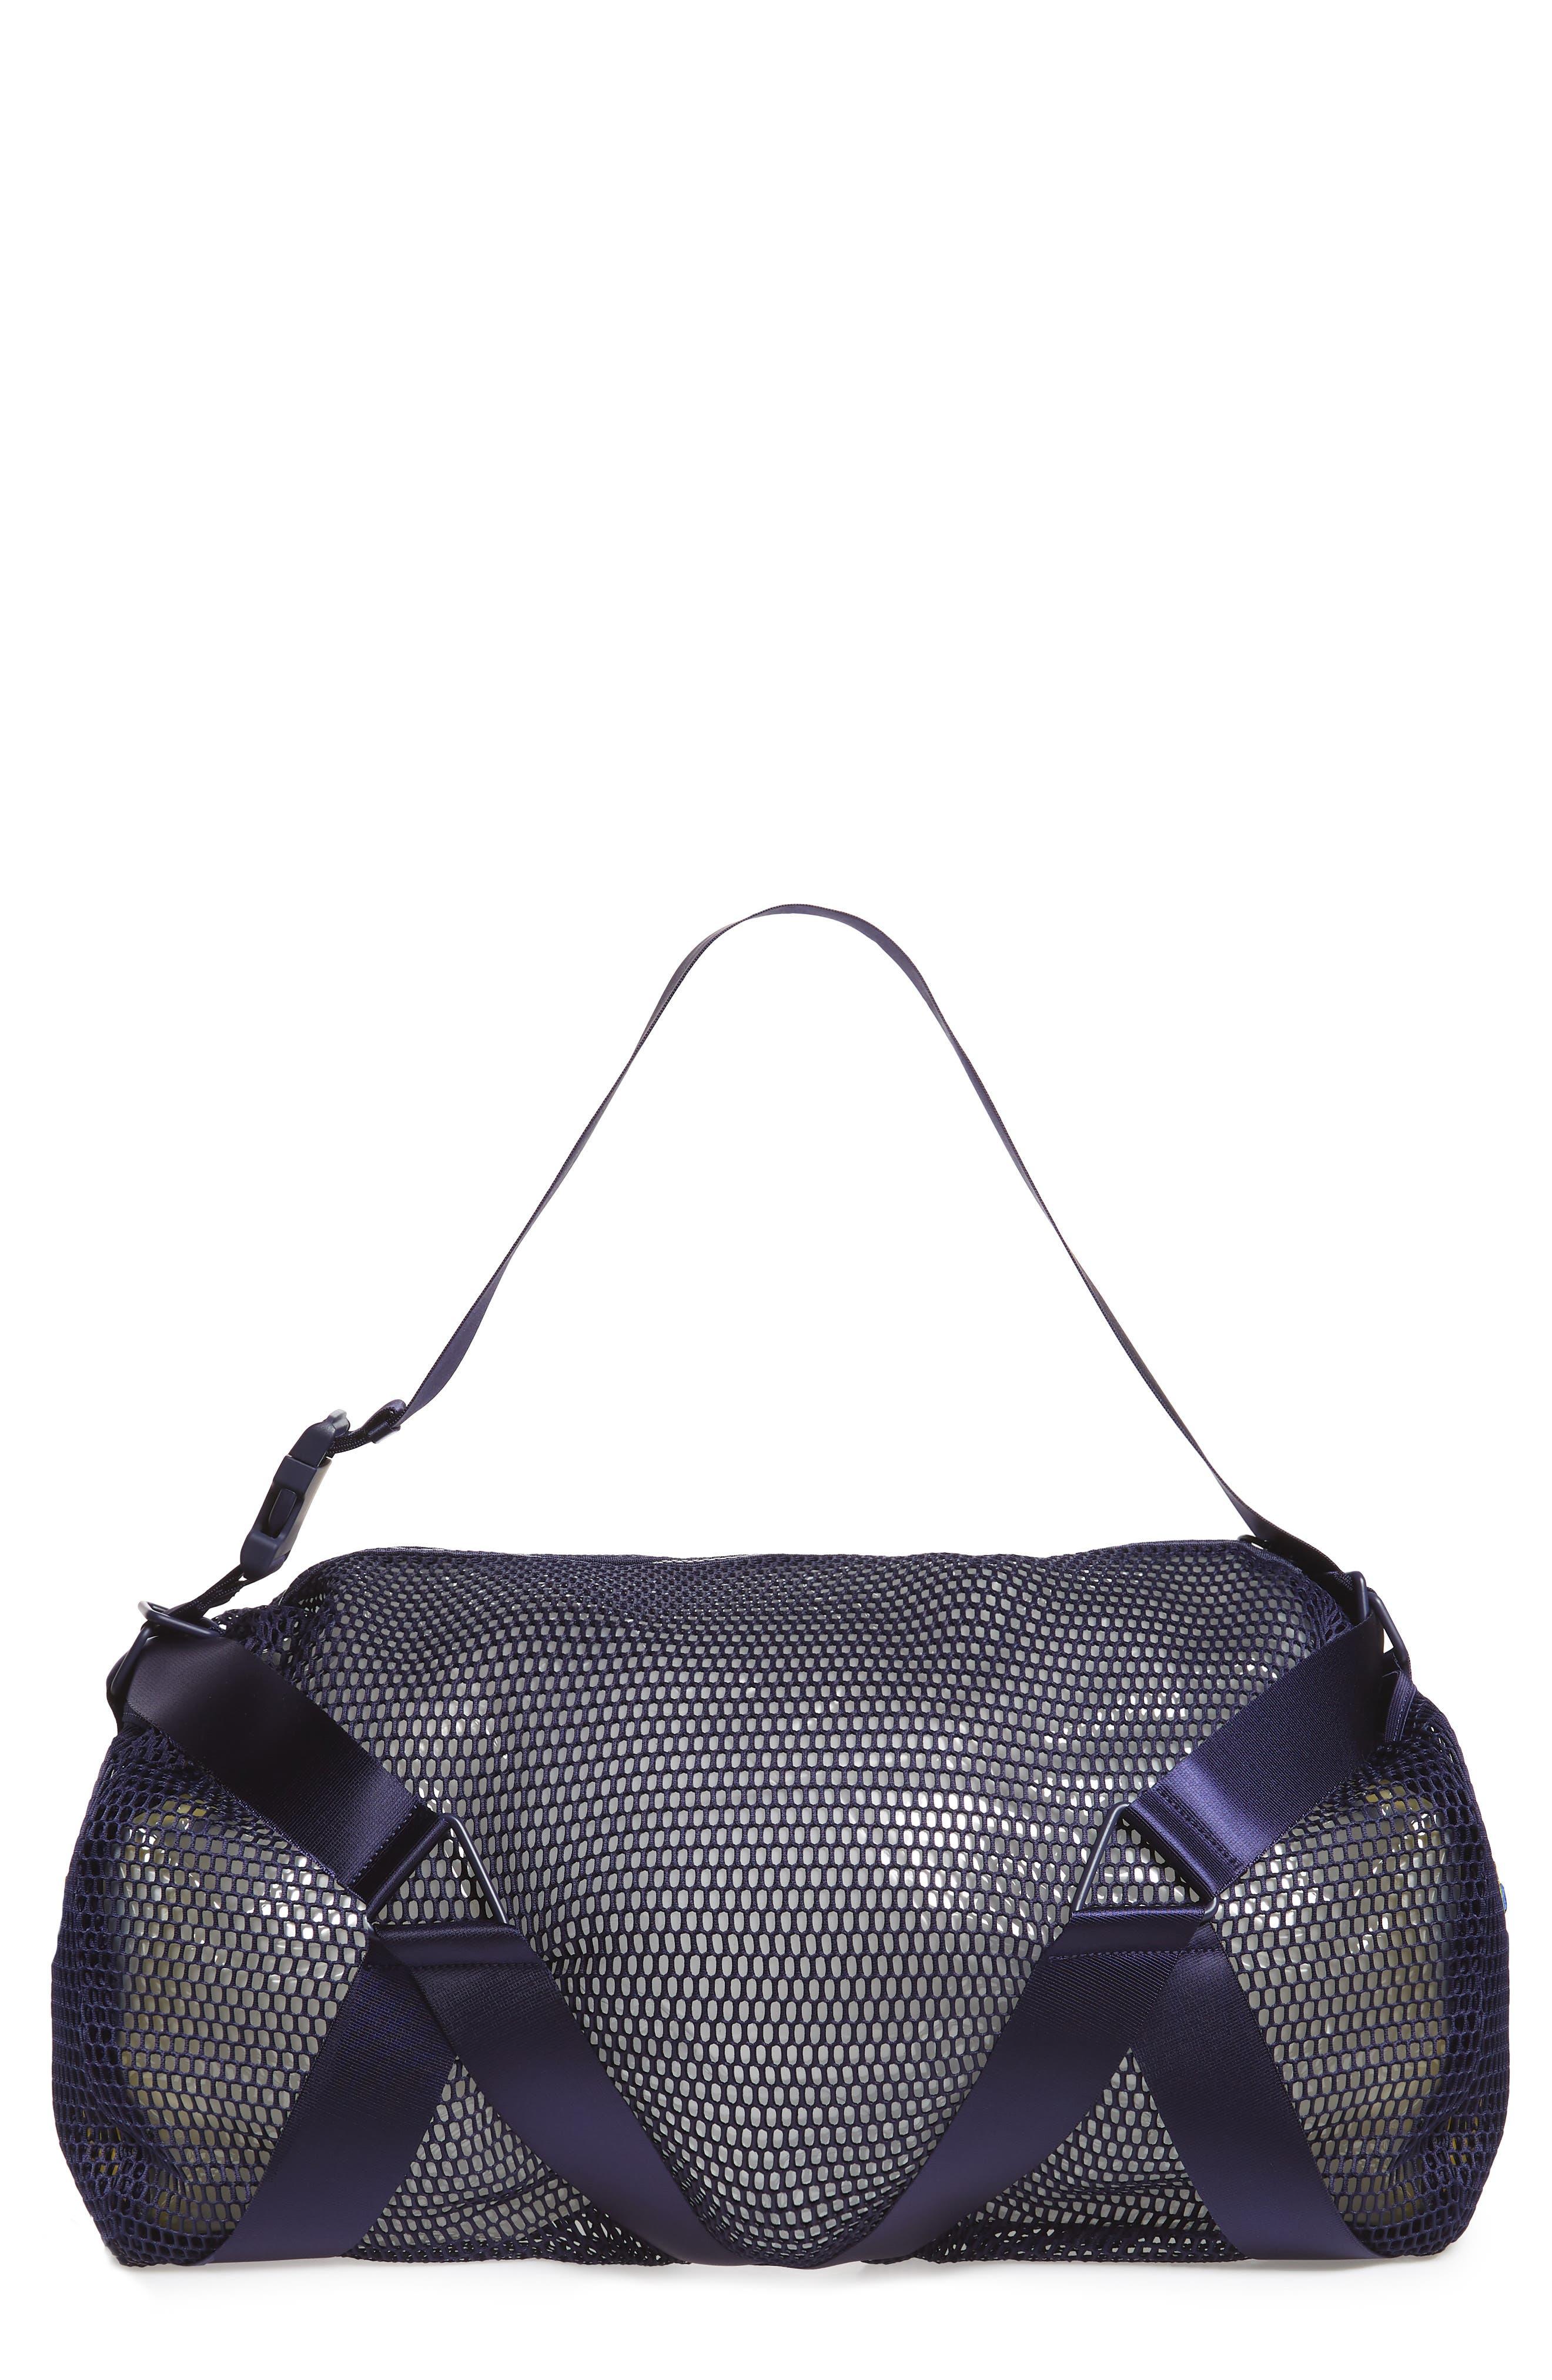 FENTY PUMA by Rihanna Mesh Hobo Bag,                         Main,                         color, 400